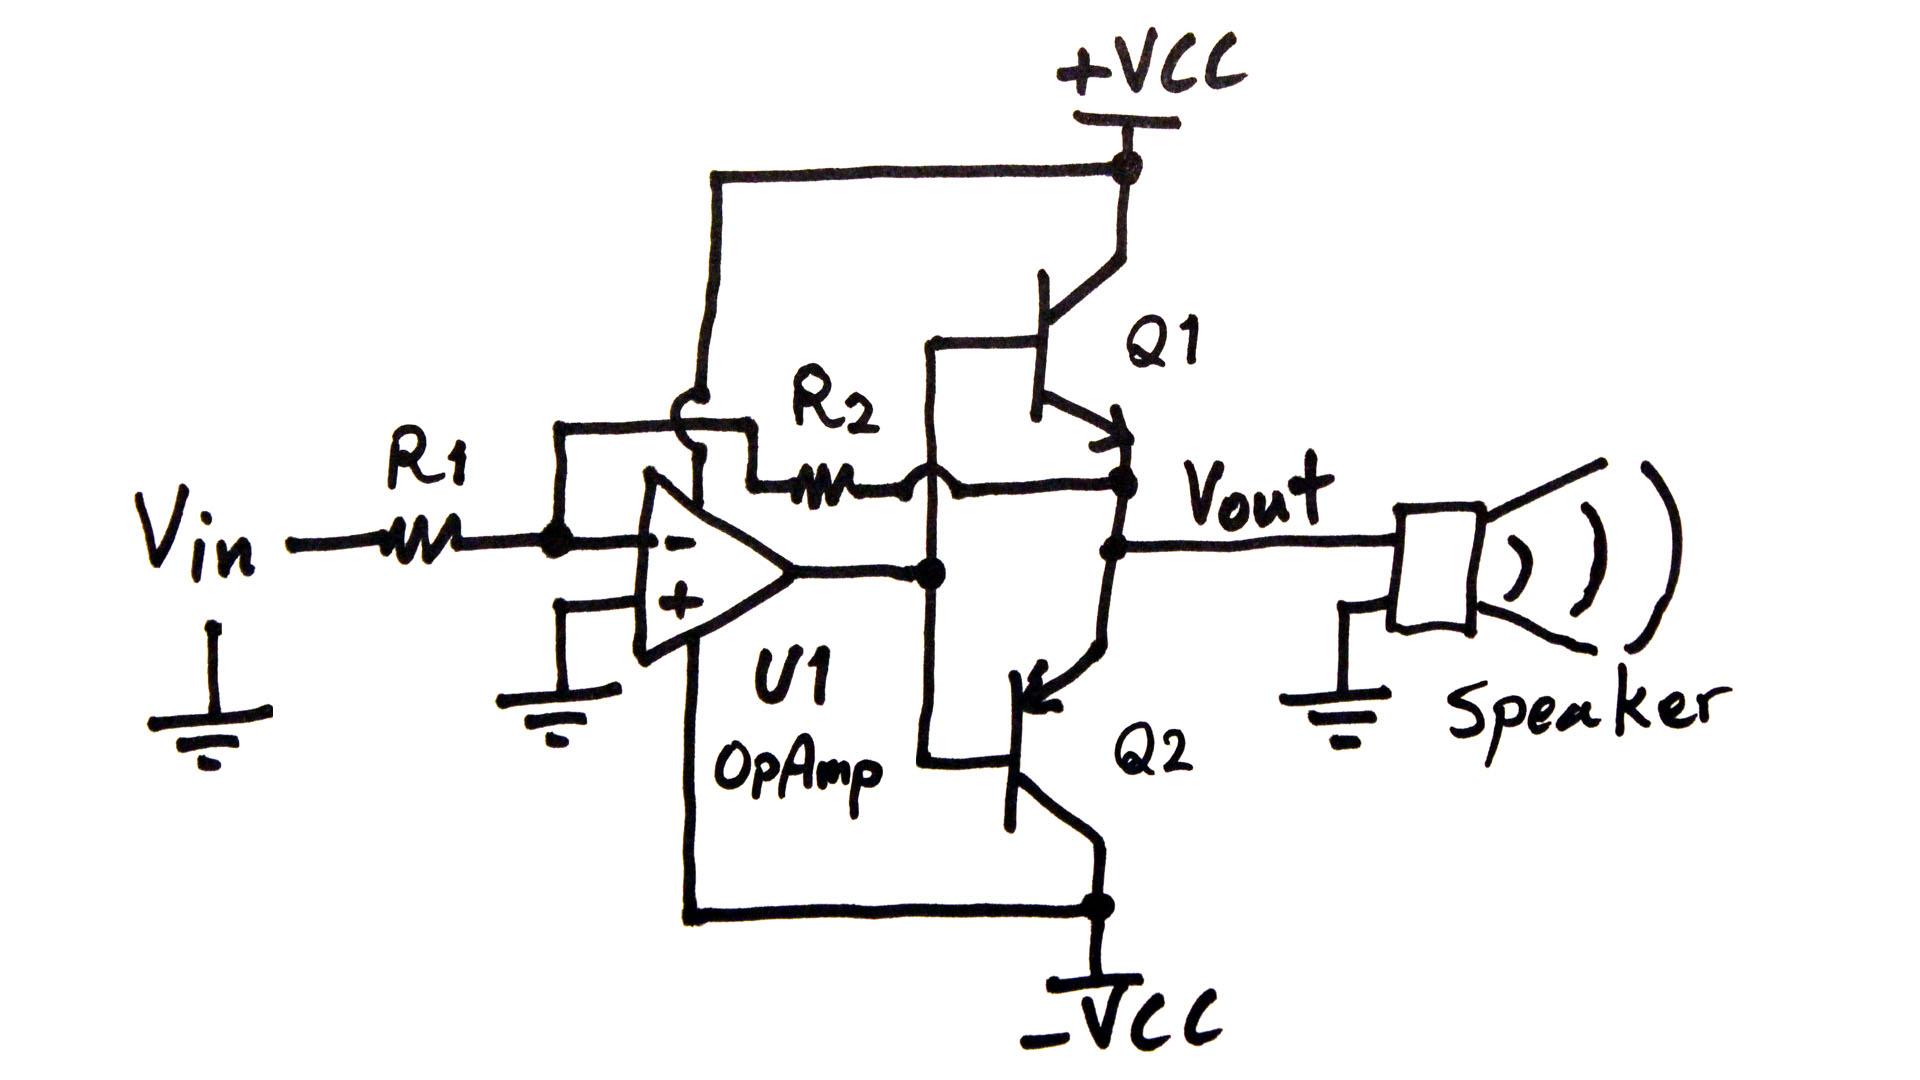 opamp audio amplifier